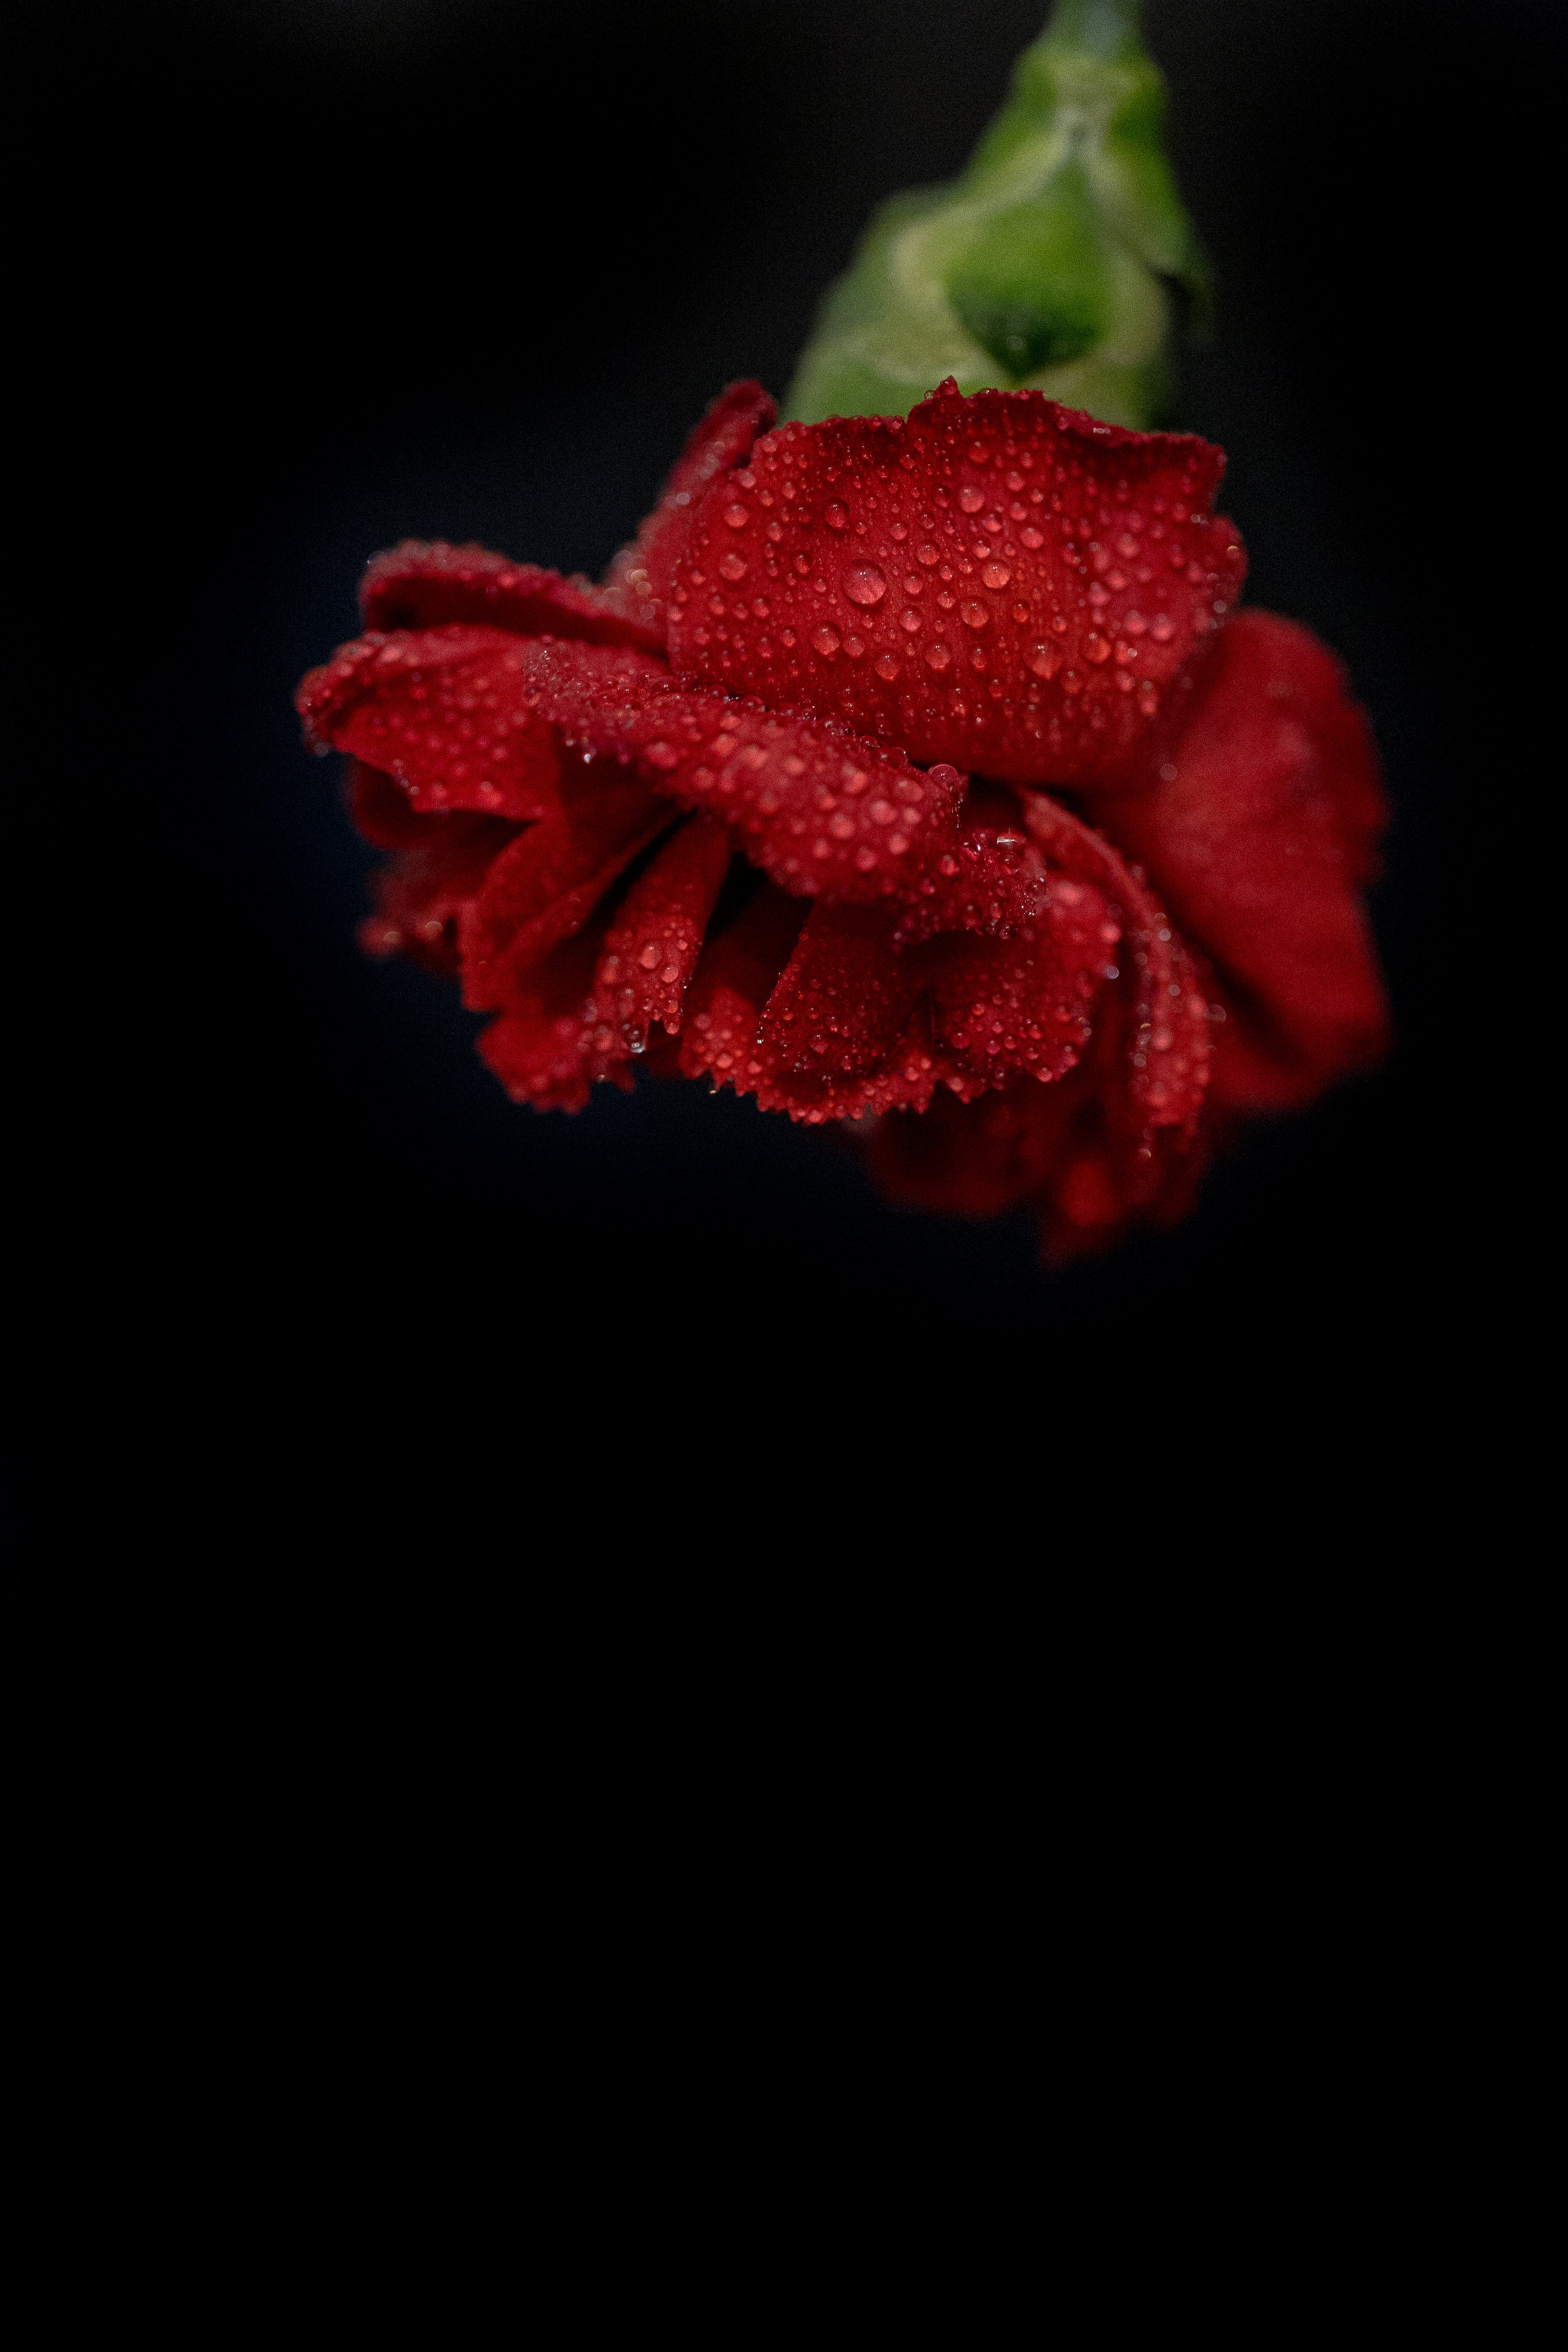 Macro floral photo